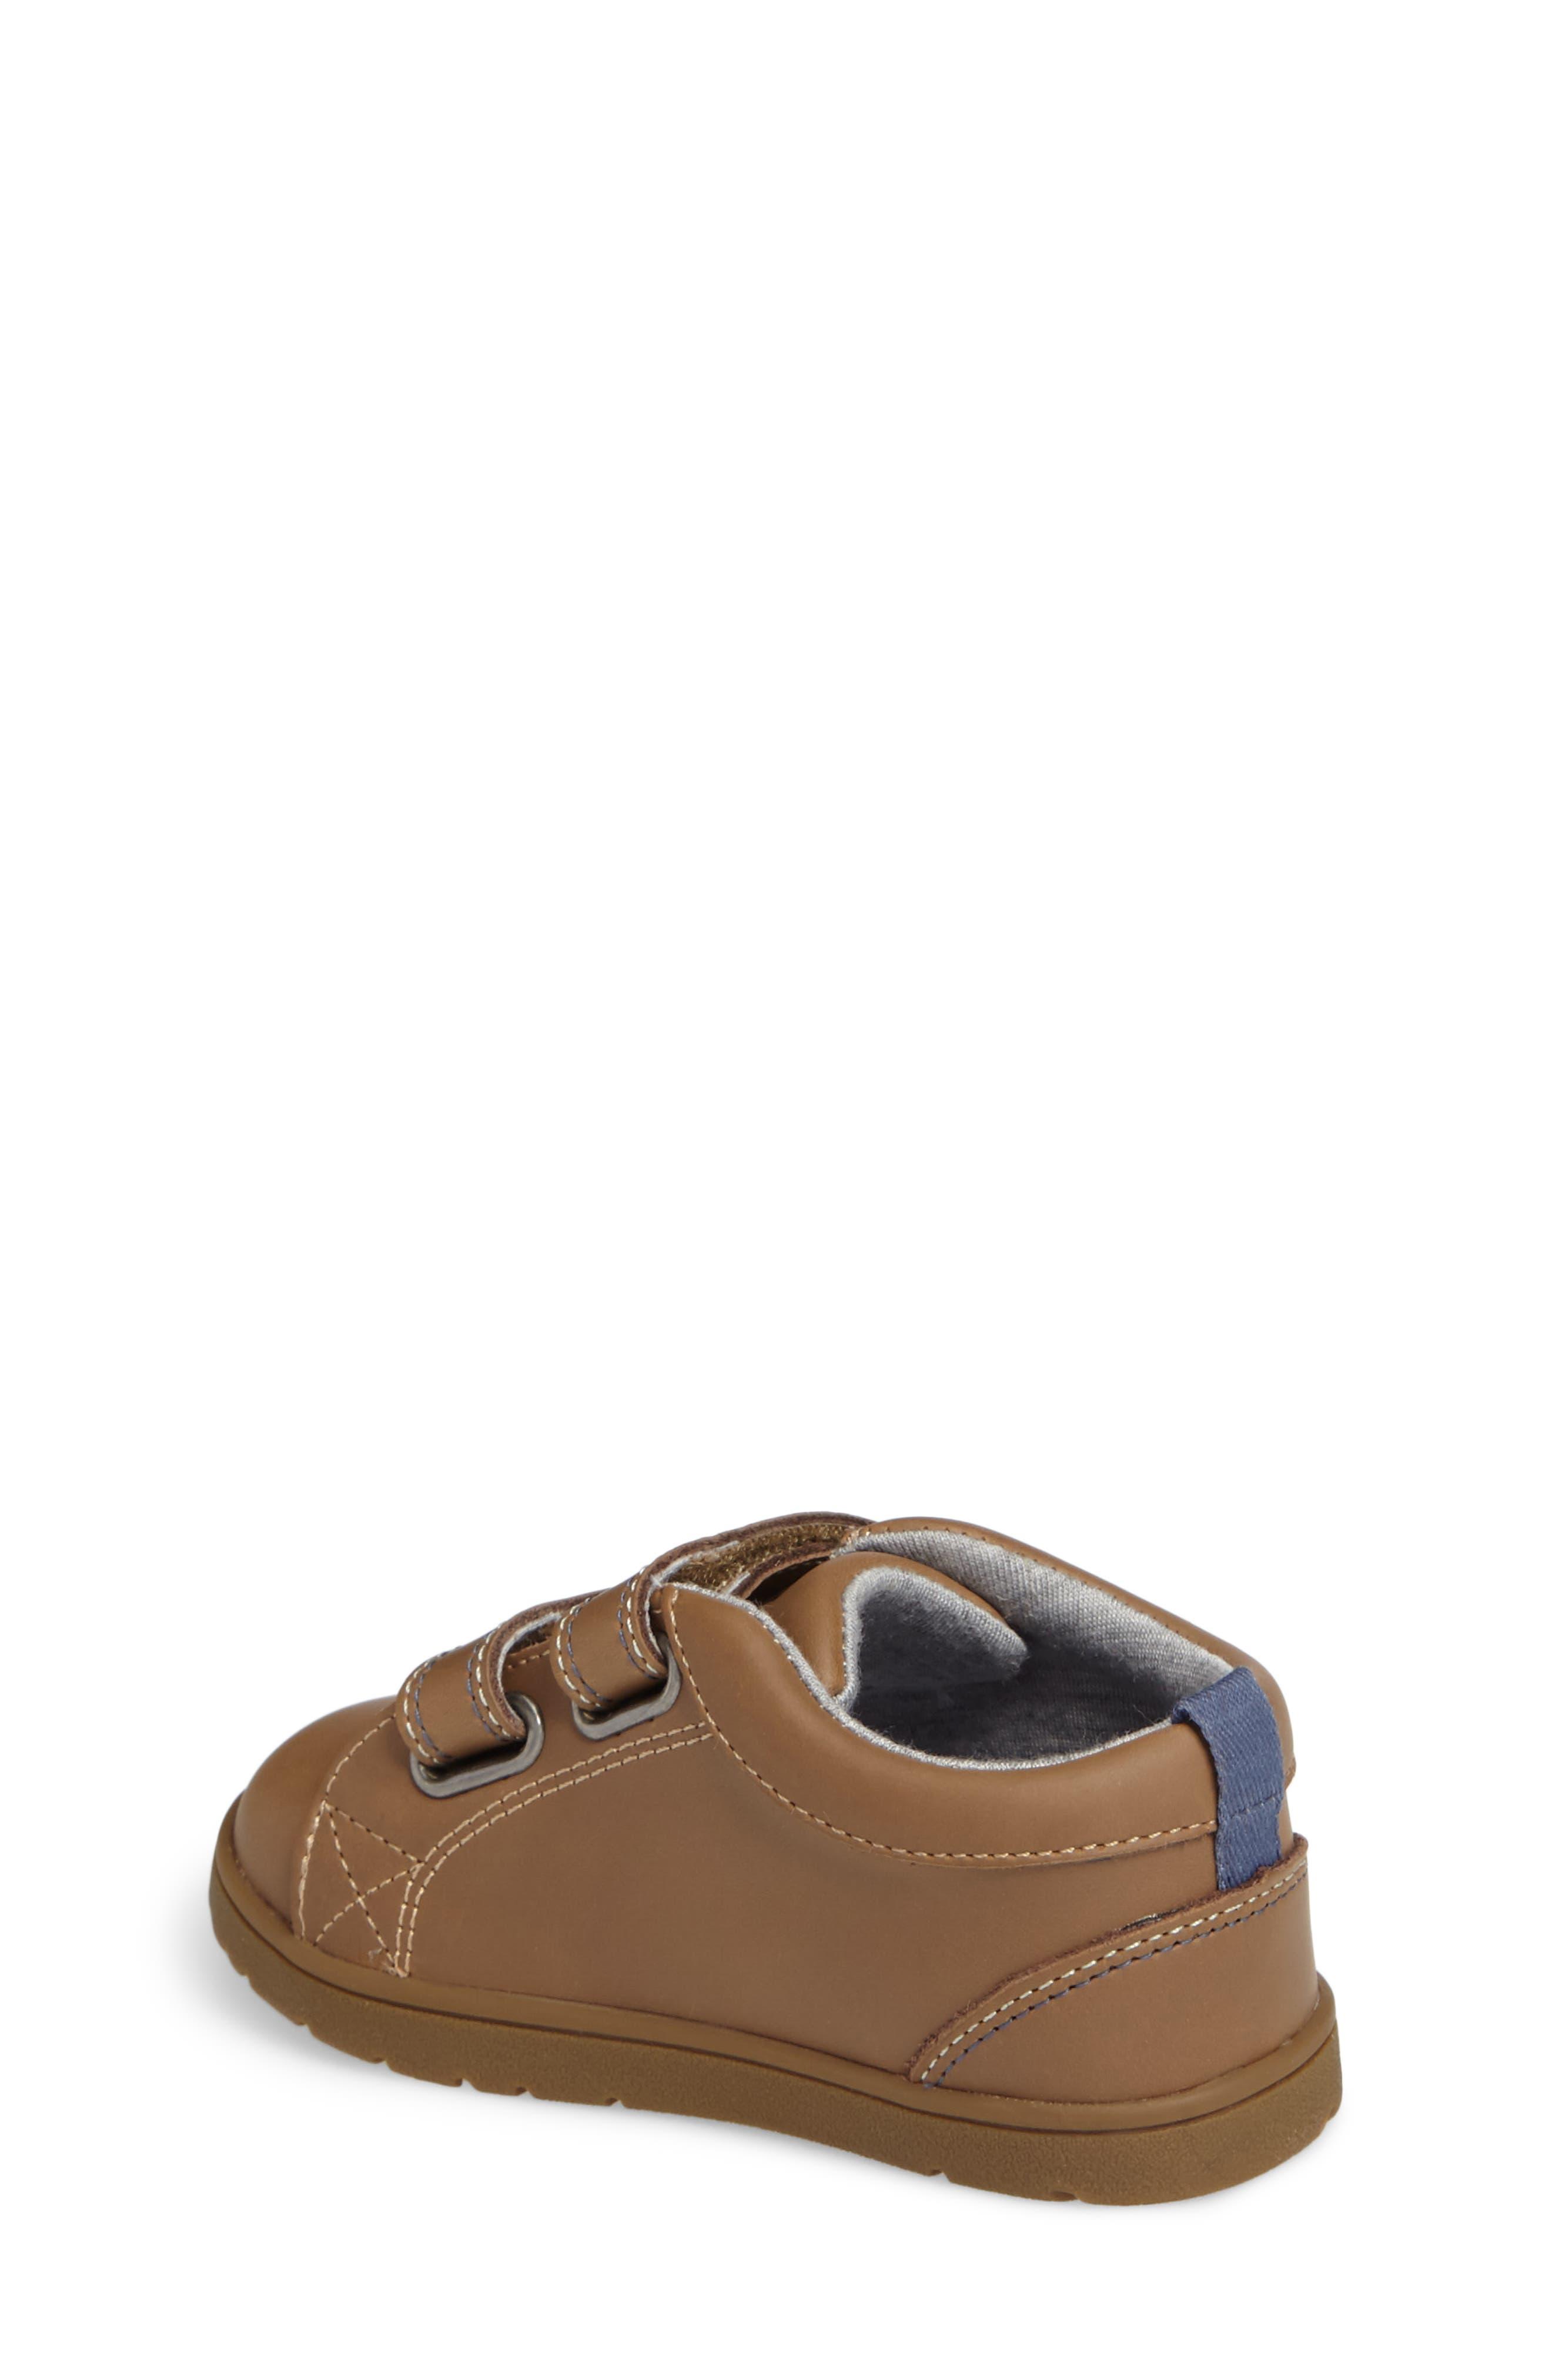 Alternate Image 2  - Tucker + Tate Conner Embroidered Sneaker (Baby, Walker & Toddler)